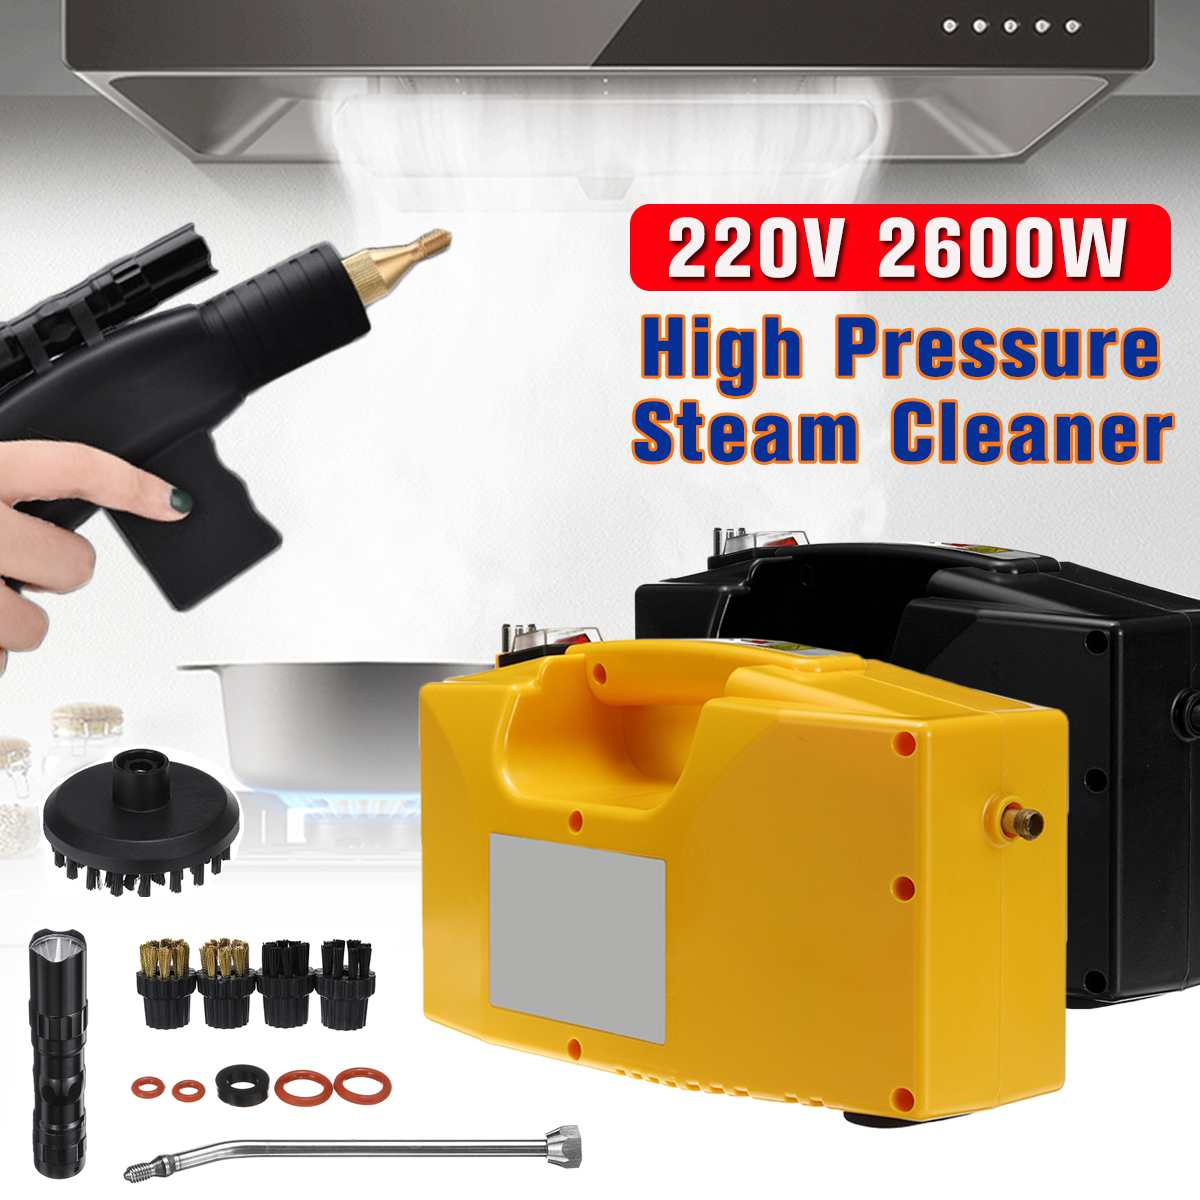 220V 2600W Handheld Steam Cleaner For Household Kitchen High Pressure Cleaning Machine Steam Generator